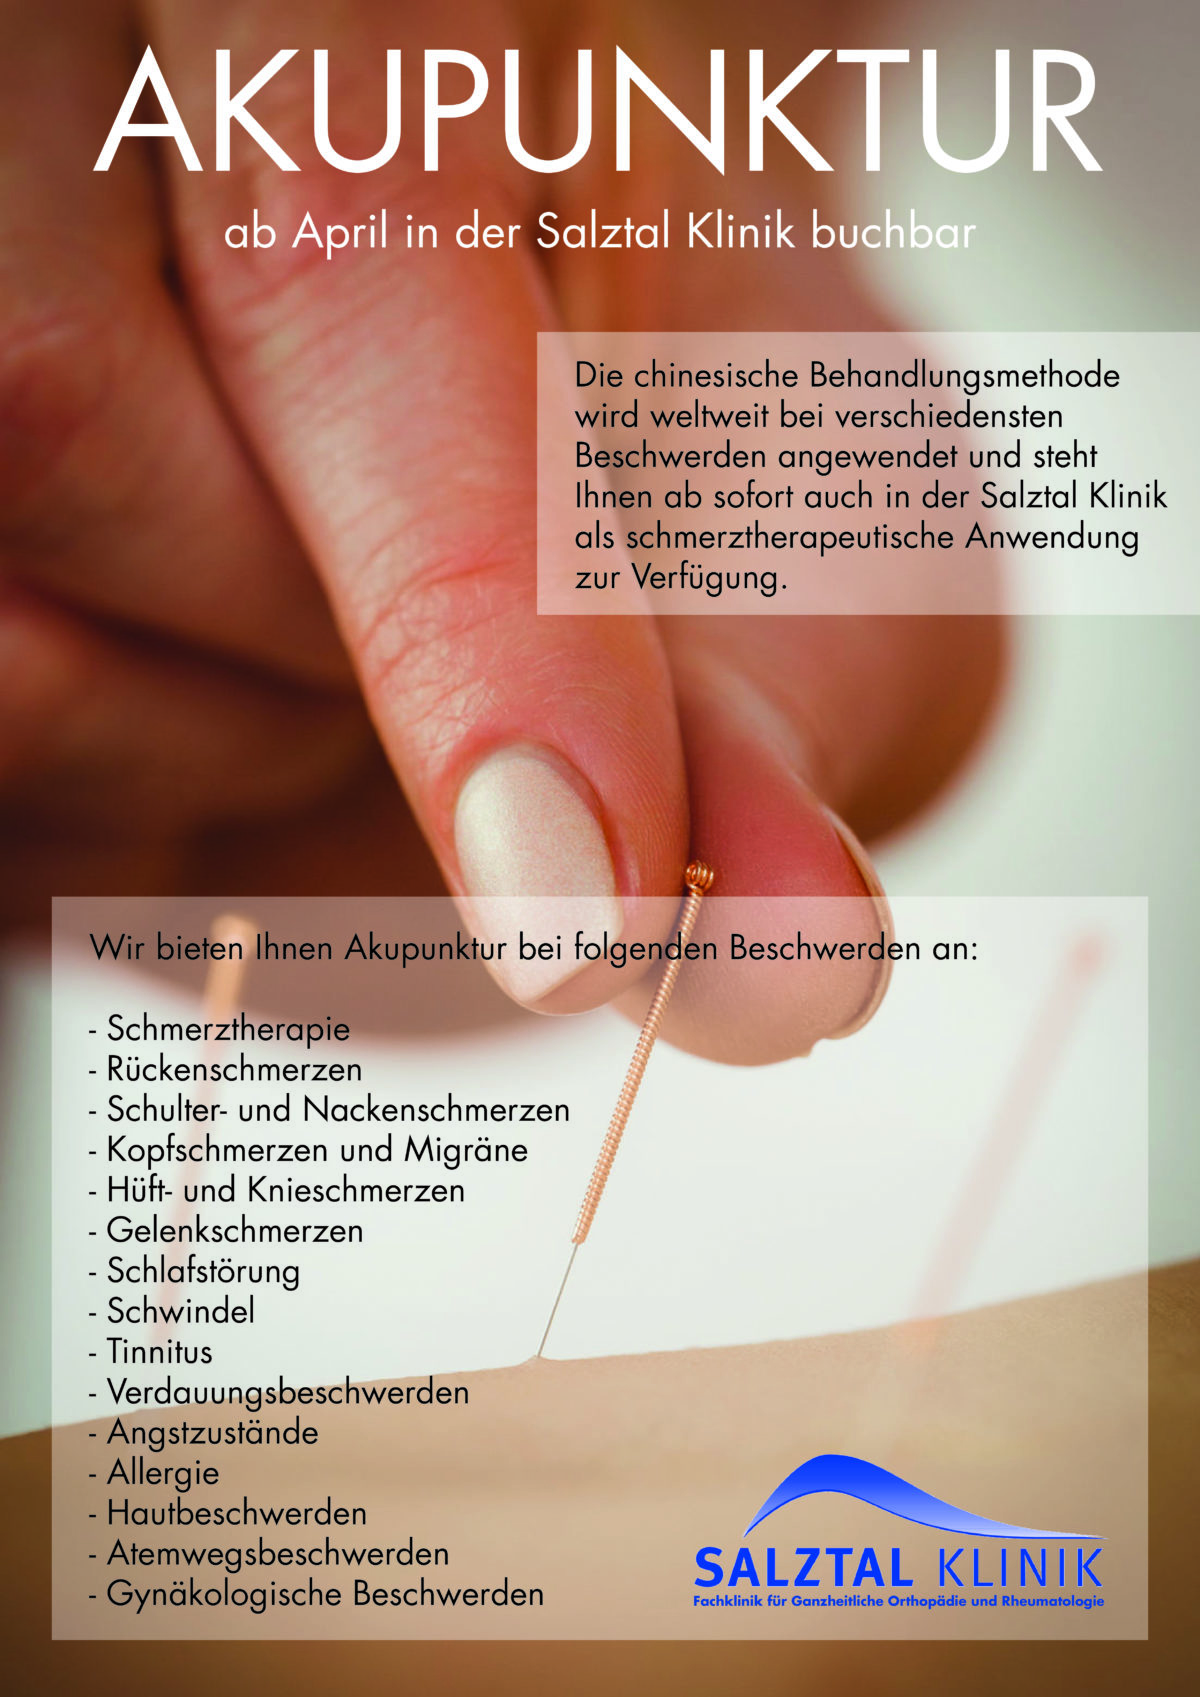 Salztalklinik_Plakat_Akupuktur-1200x1697.jpg